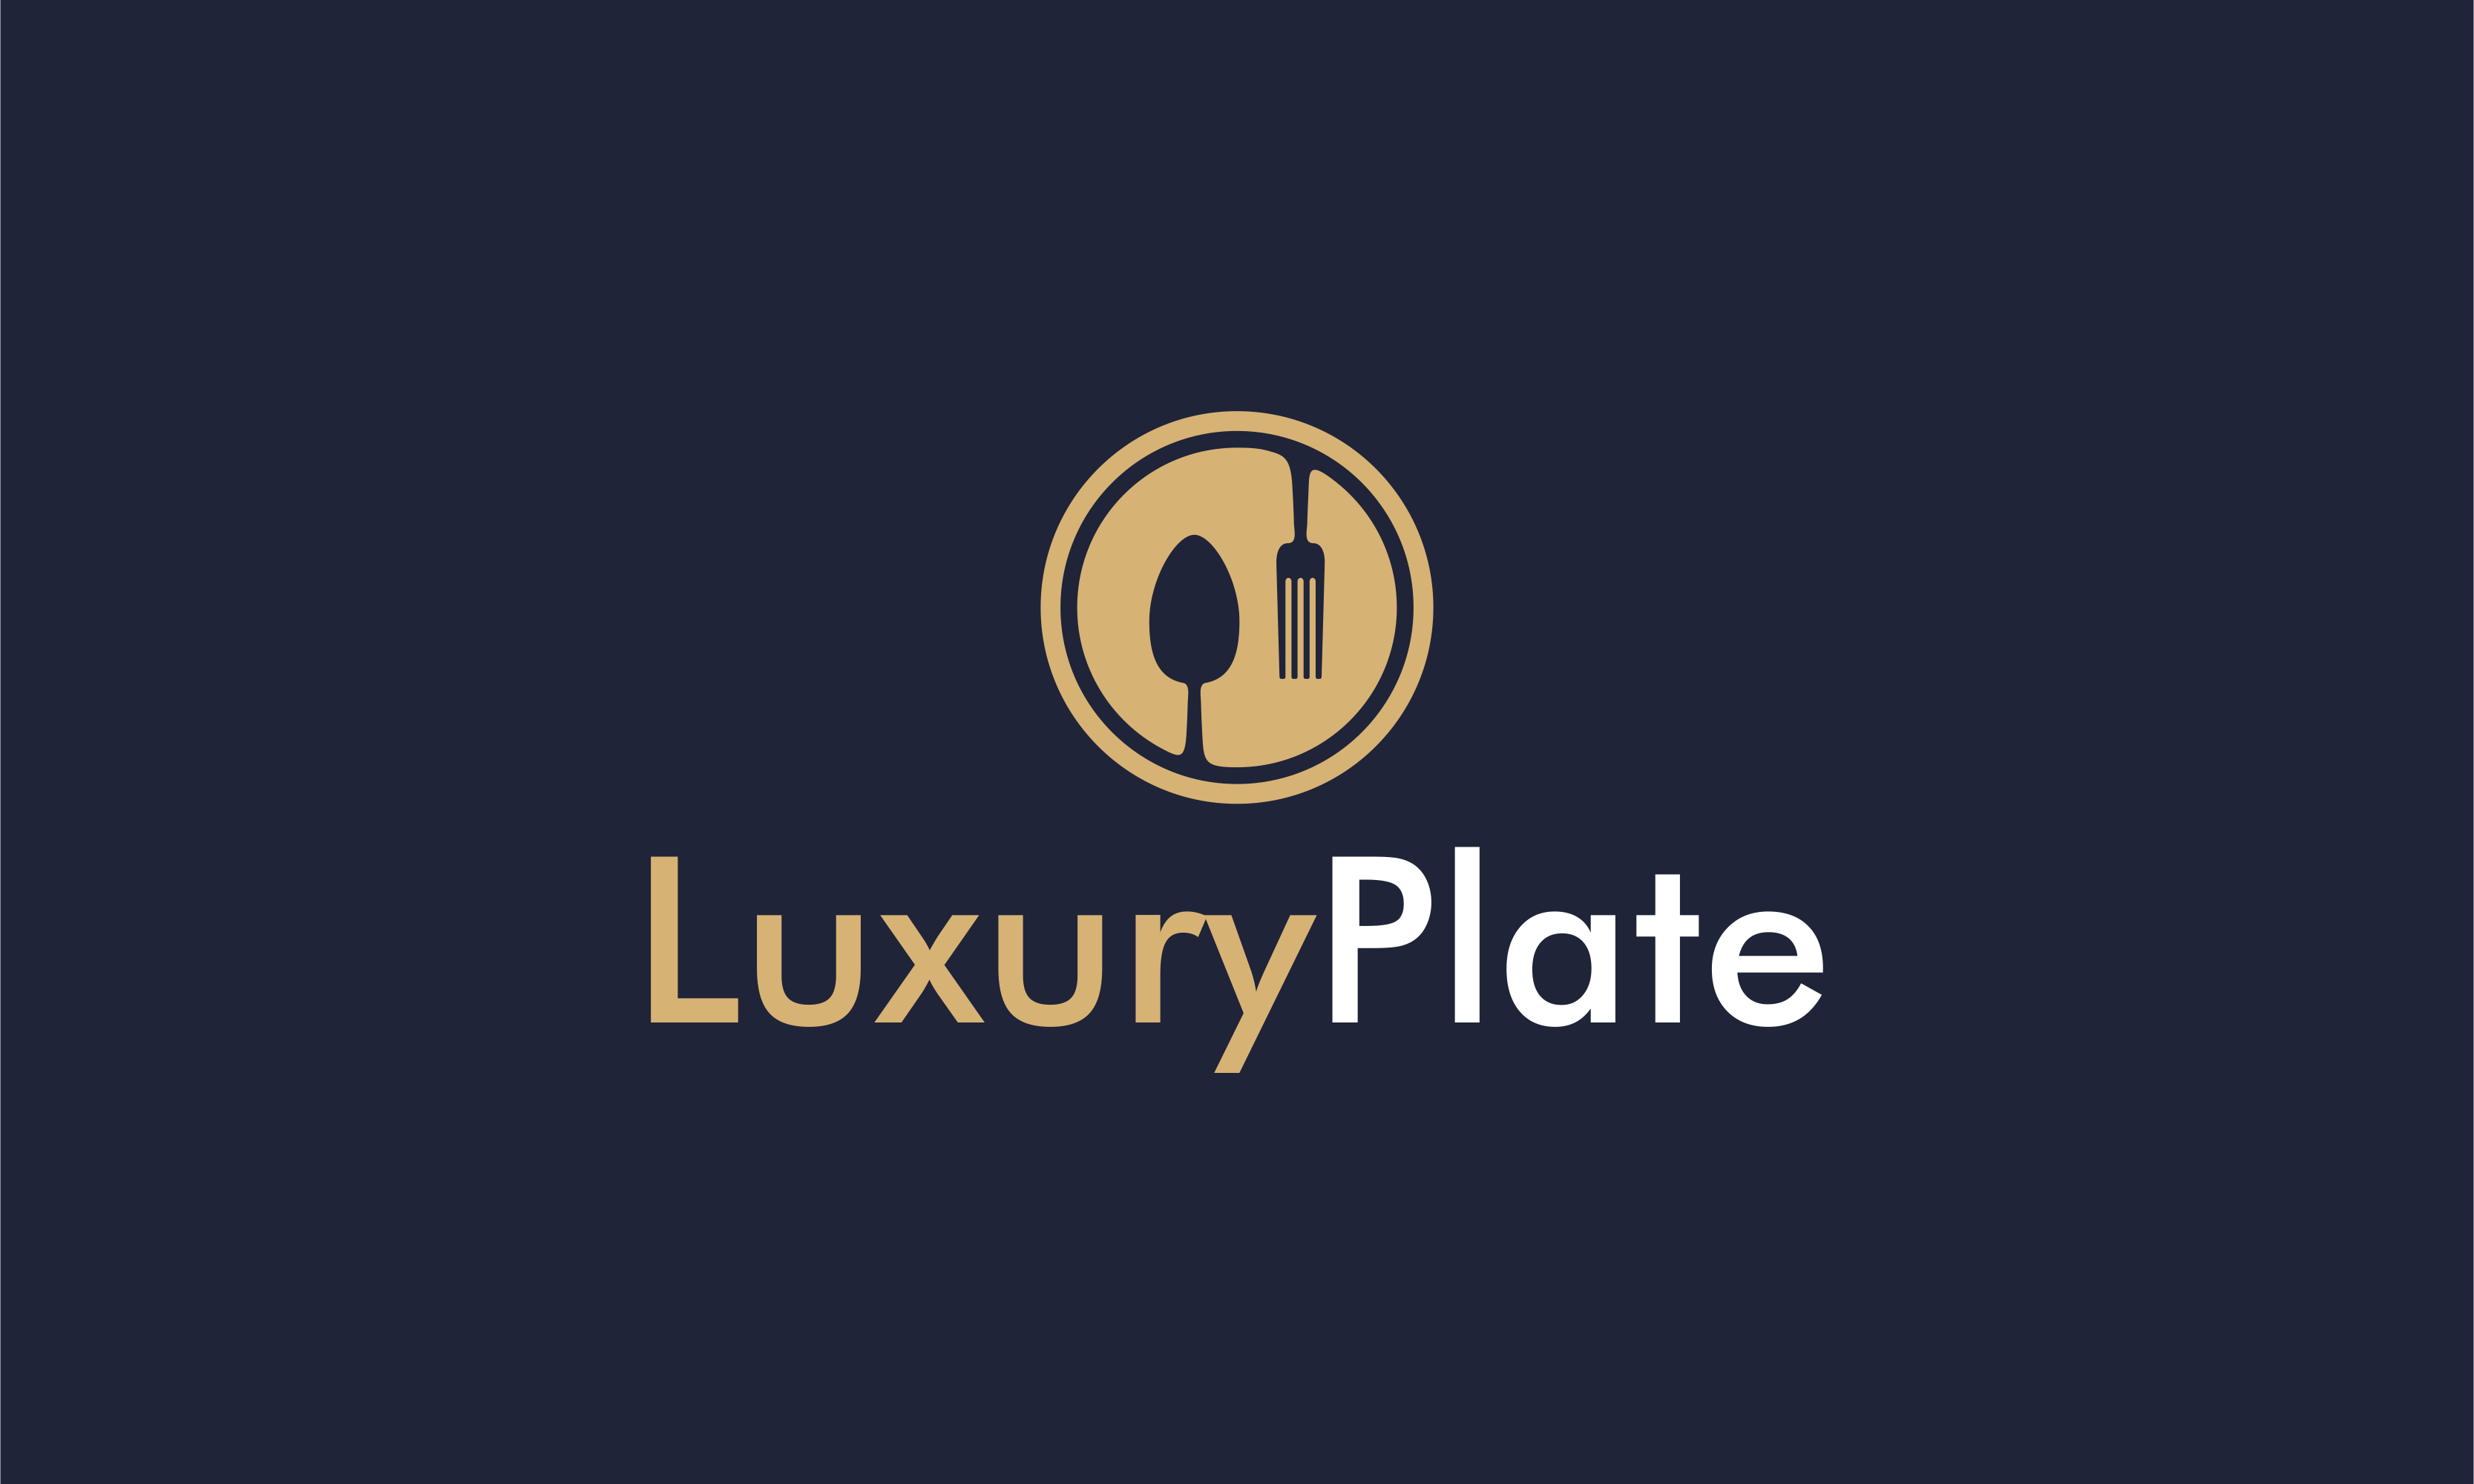 Luxuryplate